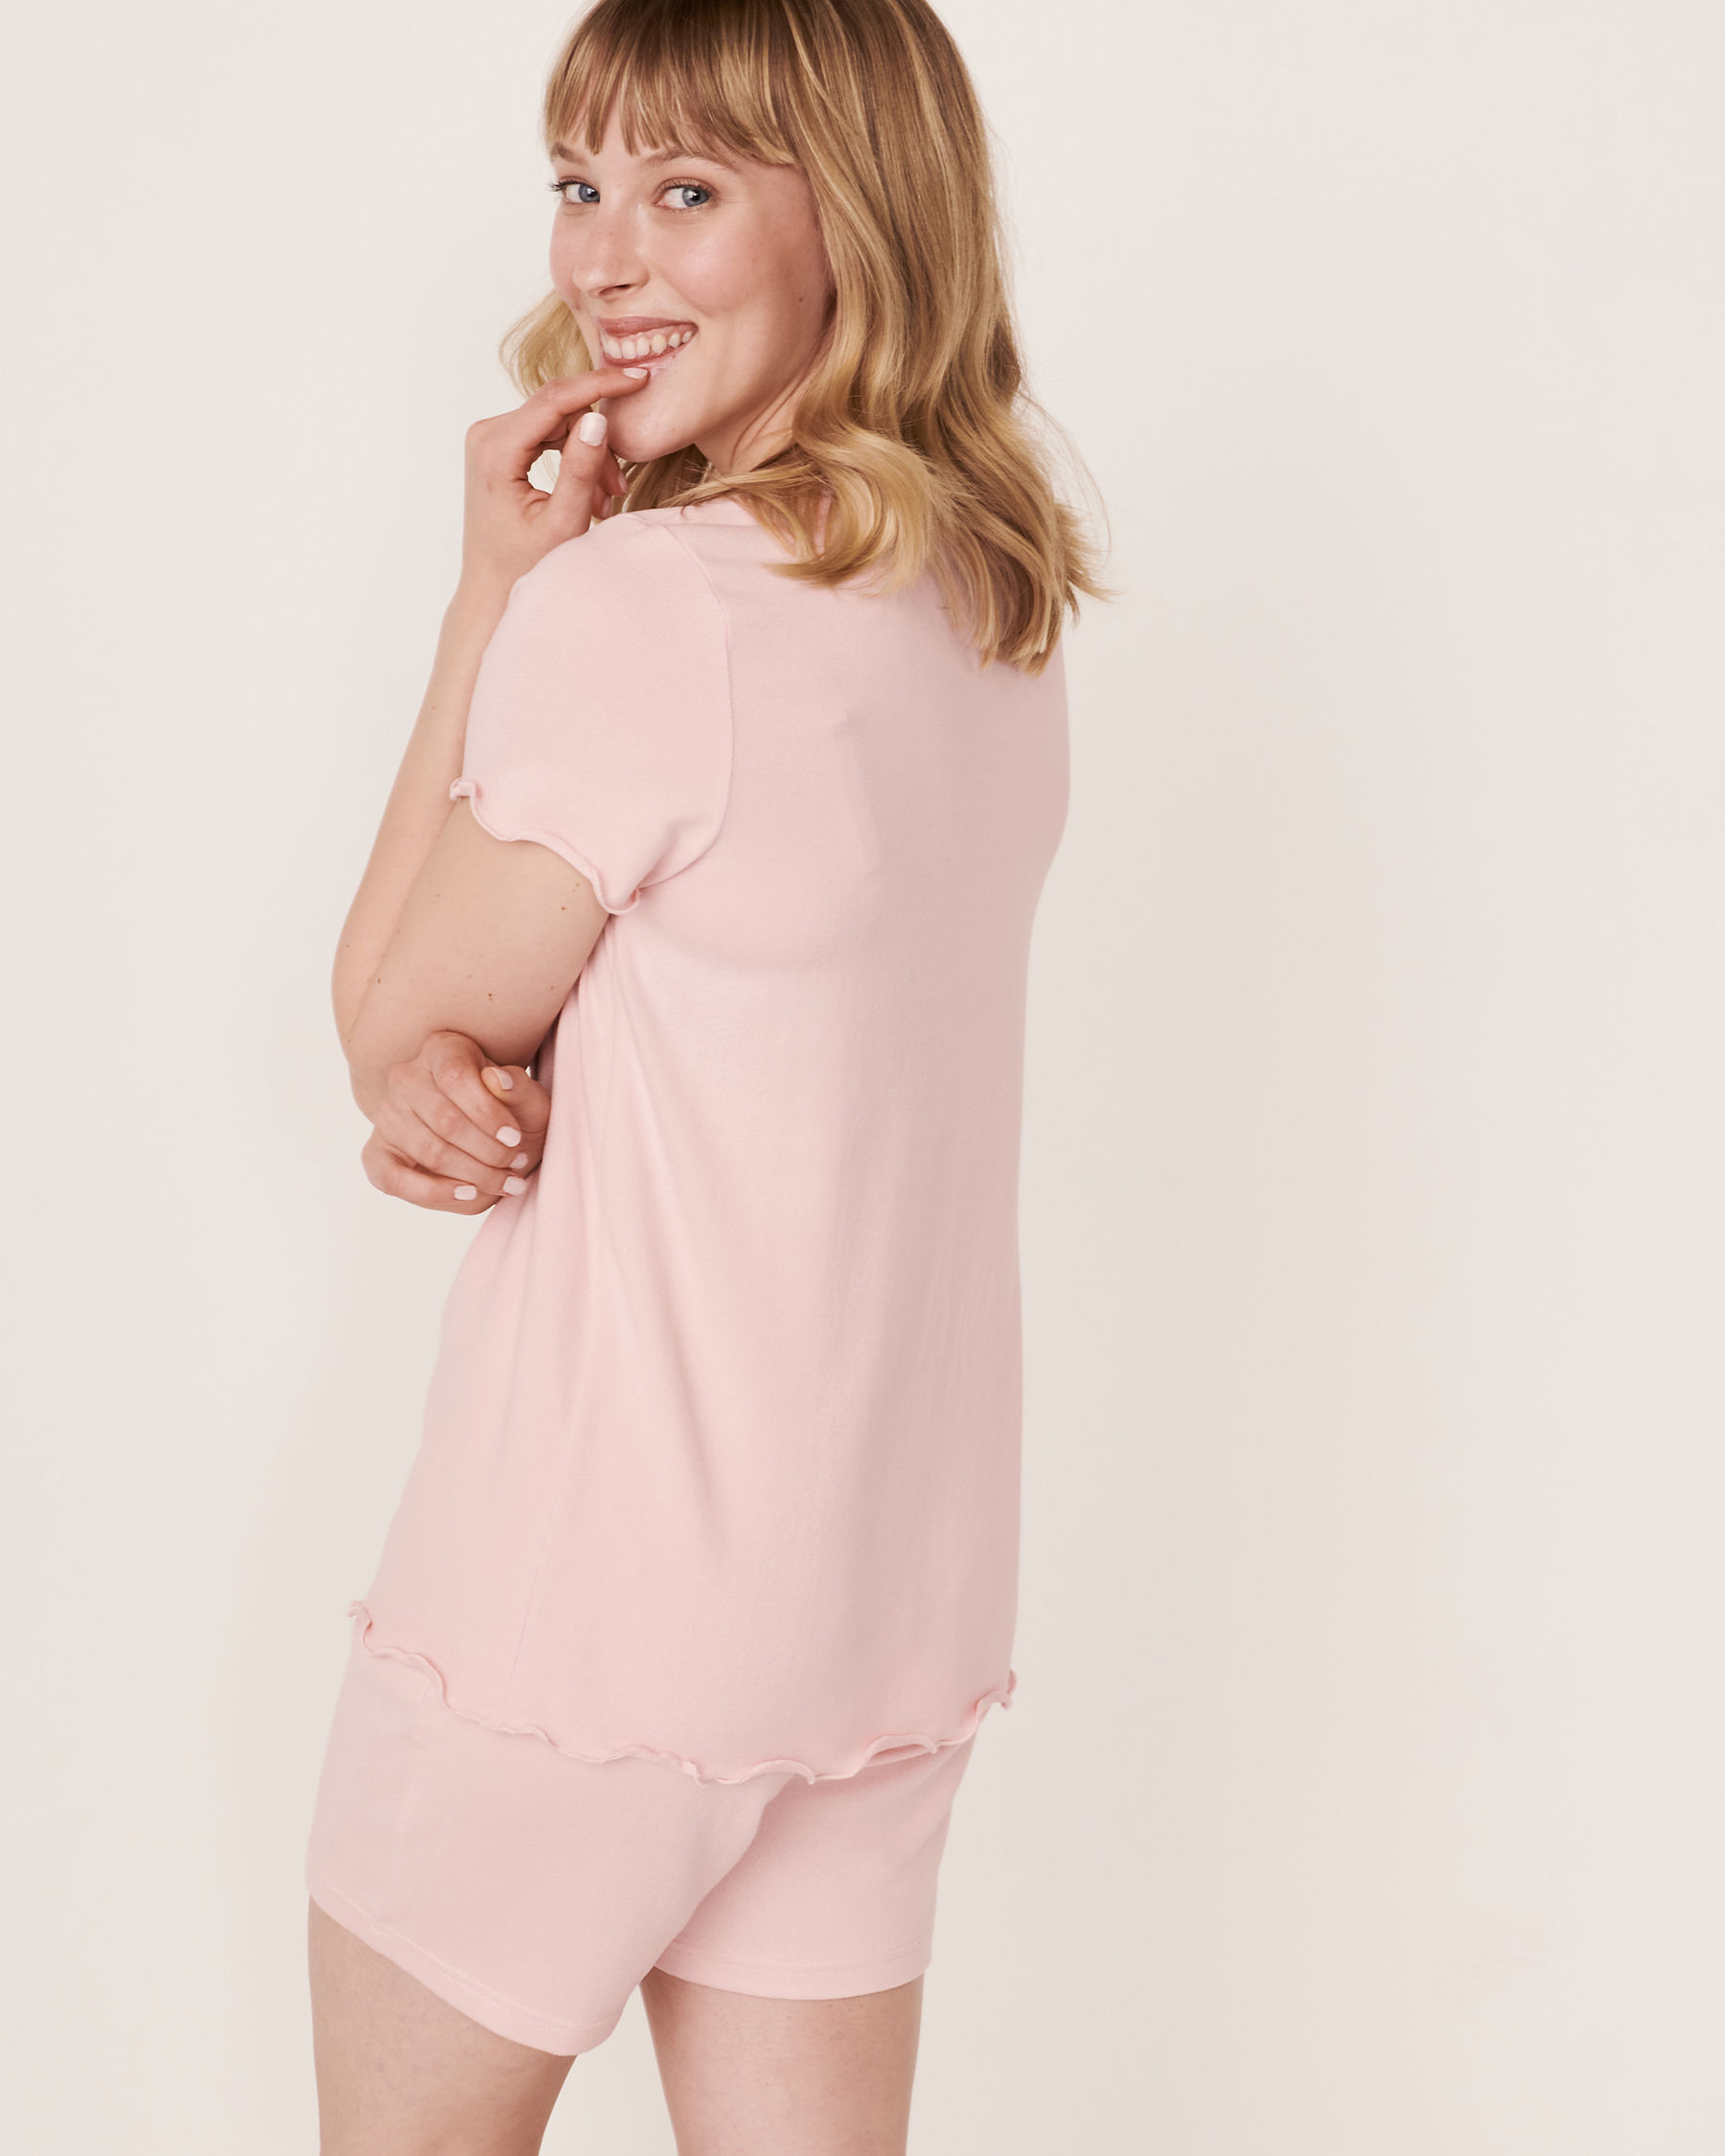 LA VIE EN ROSE Recycled Fibers Scoop Neck T-shirt Light pink 40100090 - View2